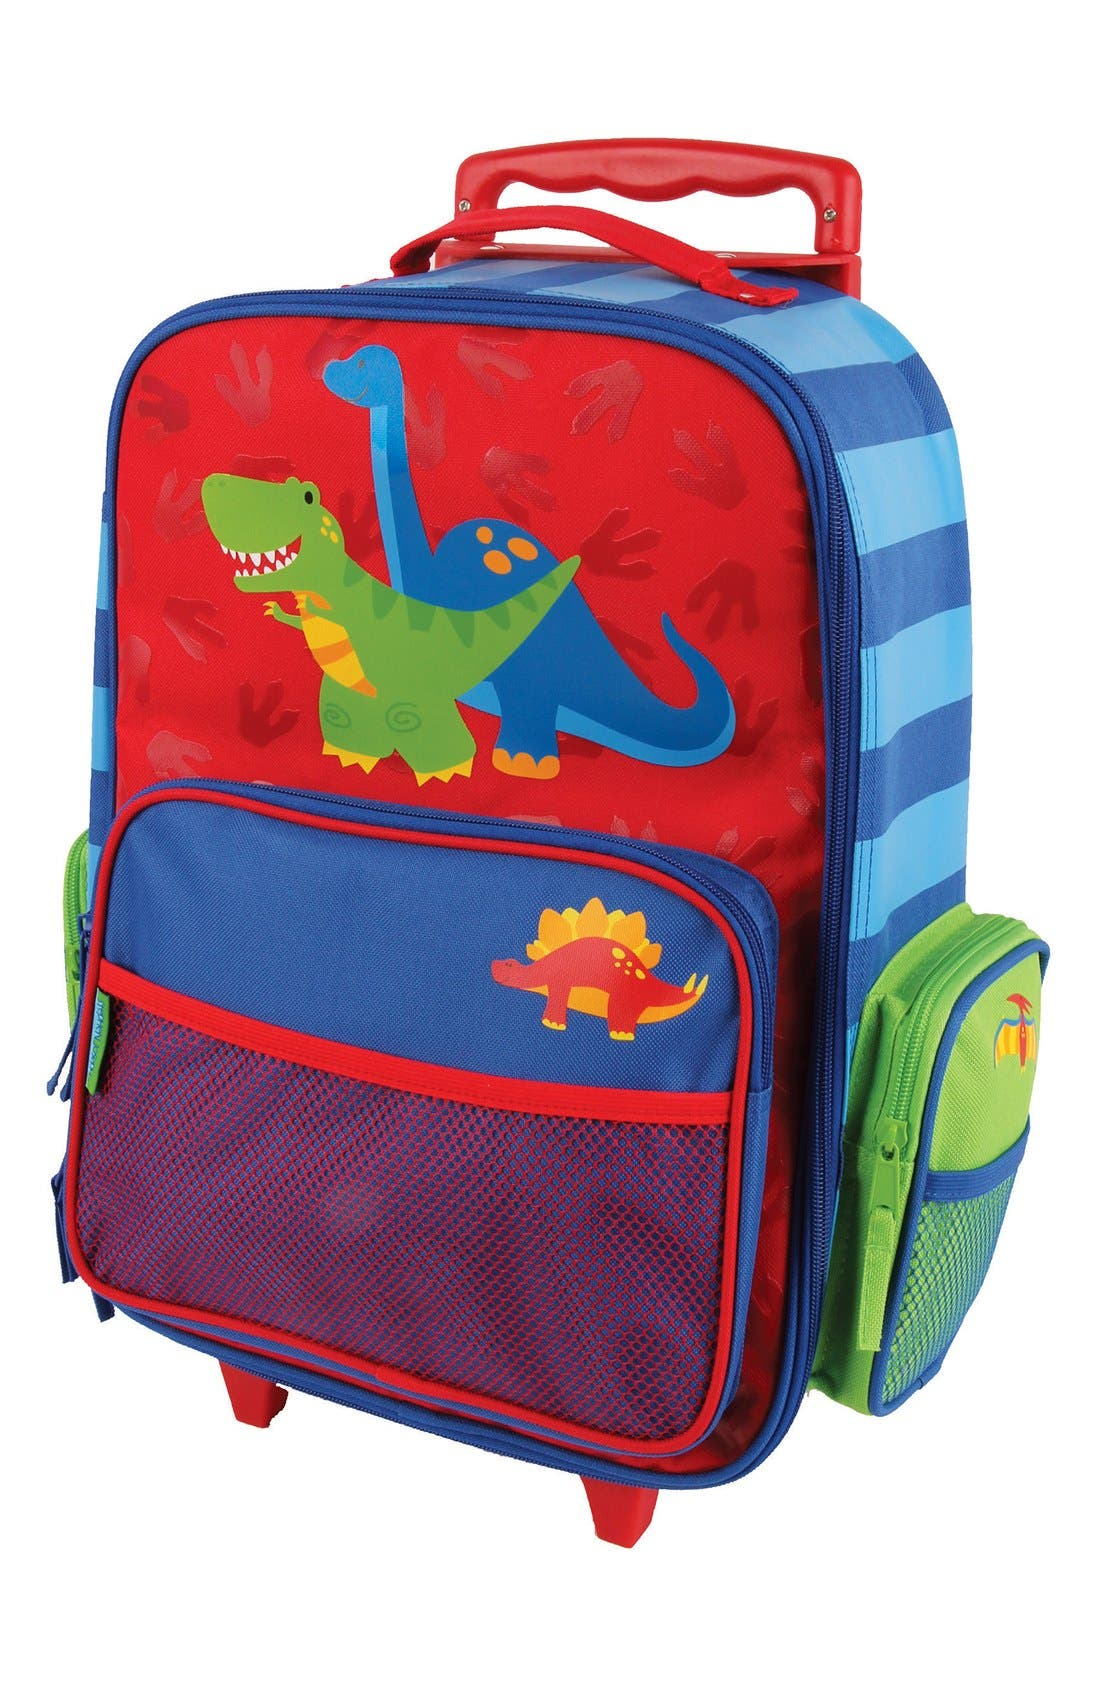 Main Image - Stephen Joseph Rolling Suitcase (Kids)